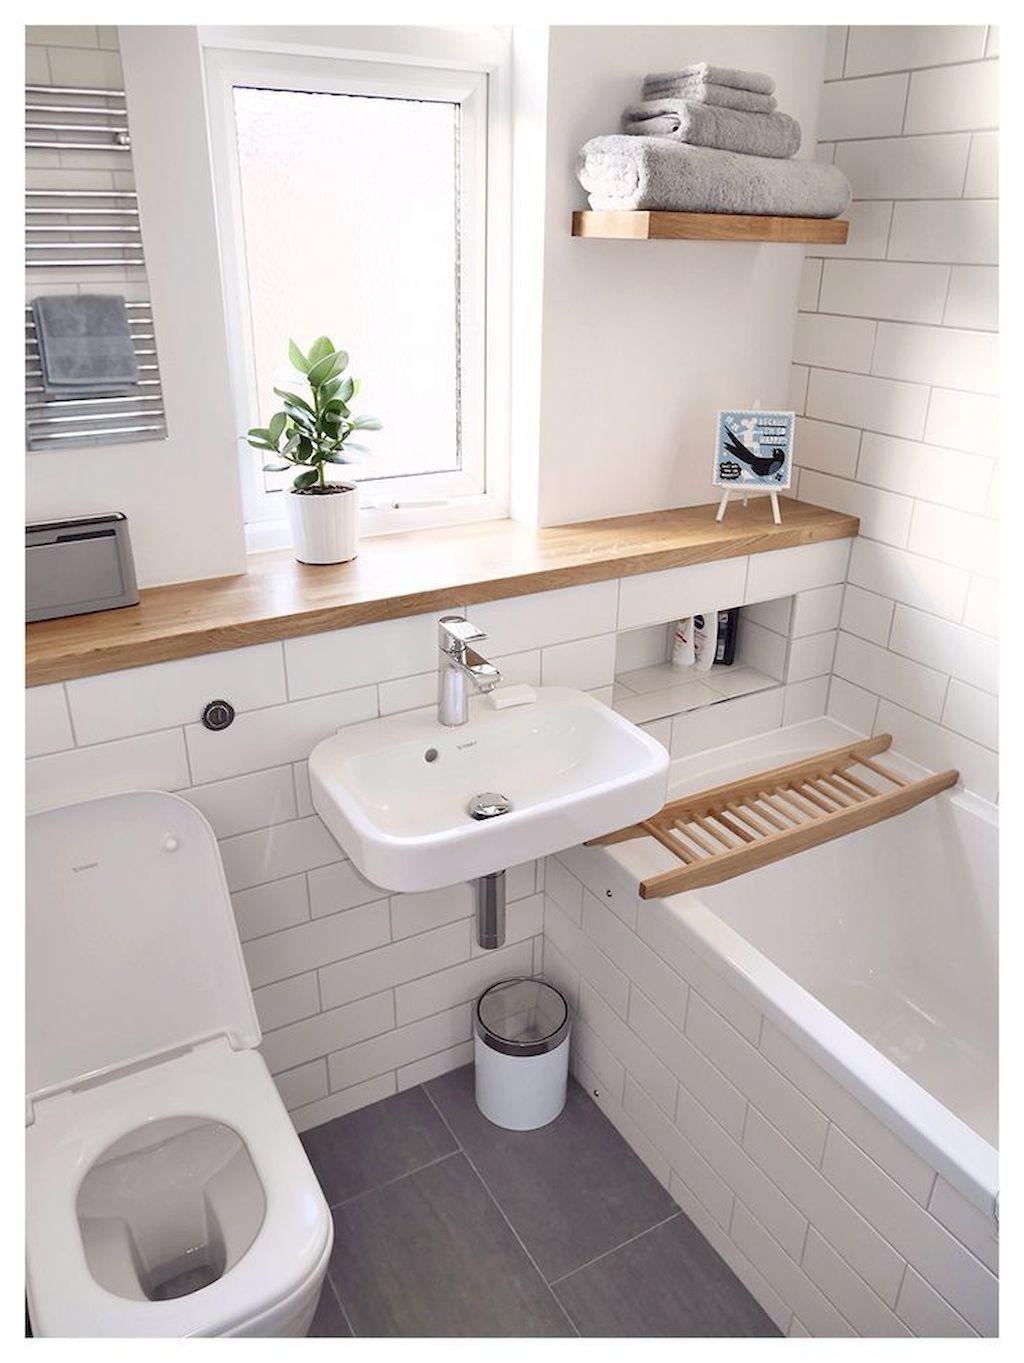 90 Master Bathroom Decorating Ideas